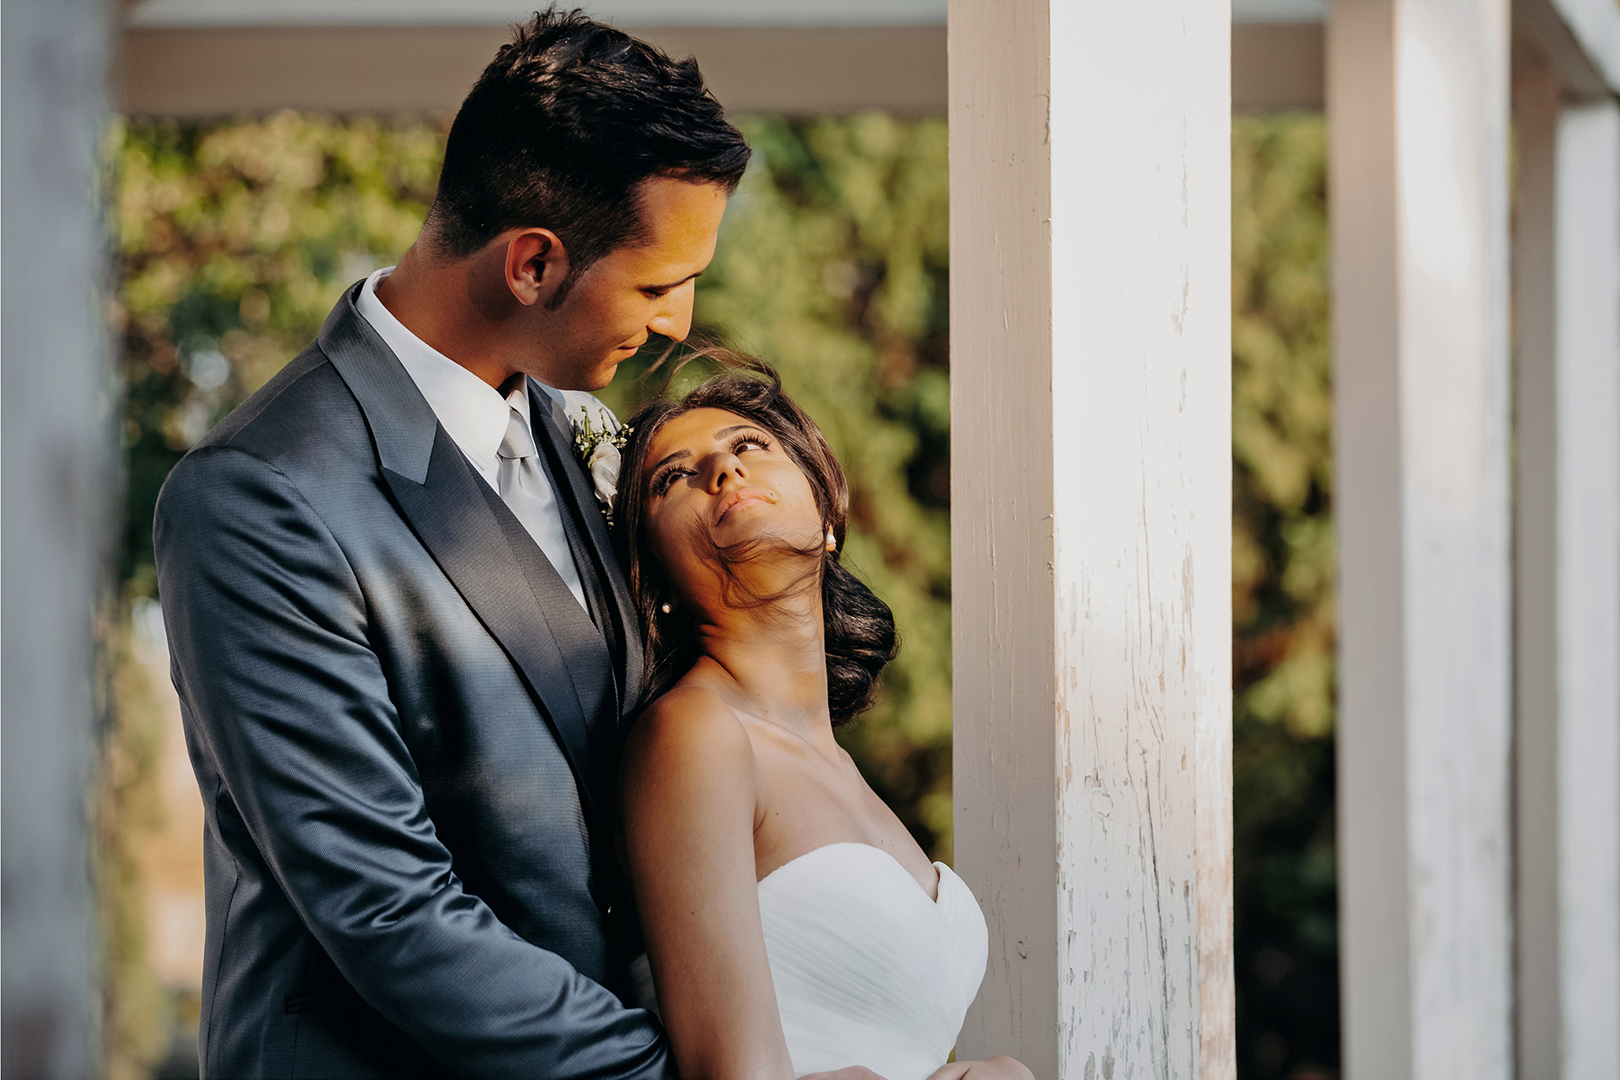 63 gianni-lepore-foto-fotografo-puglia-foggia-lucera-italia-fineart-sposo-sposa-sposi